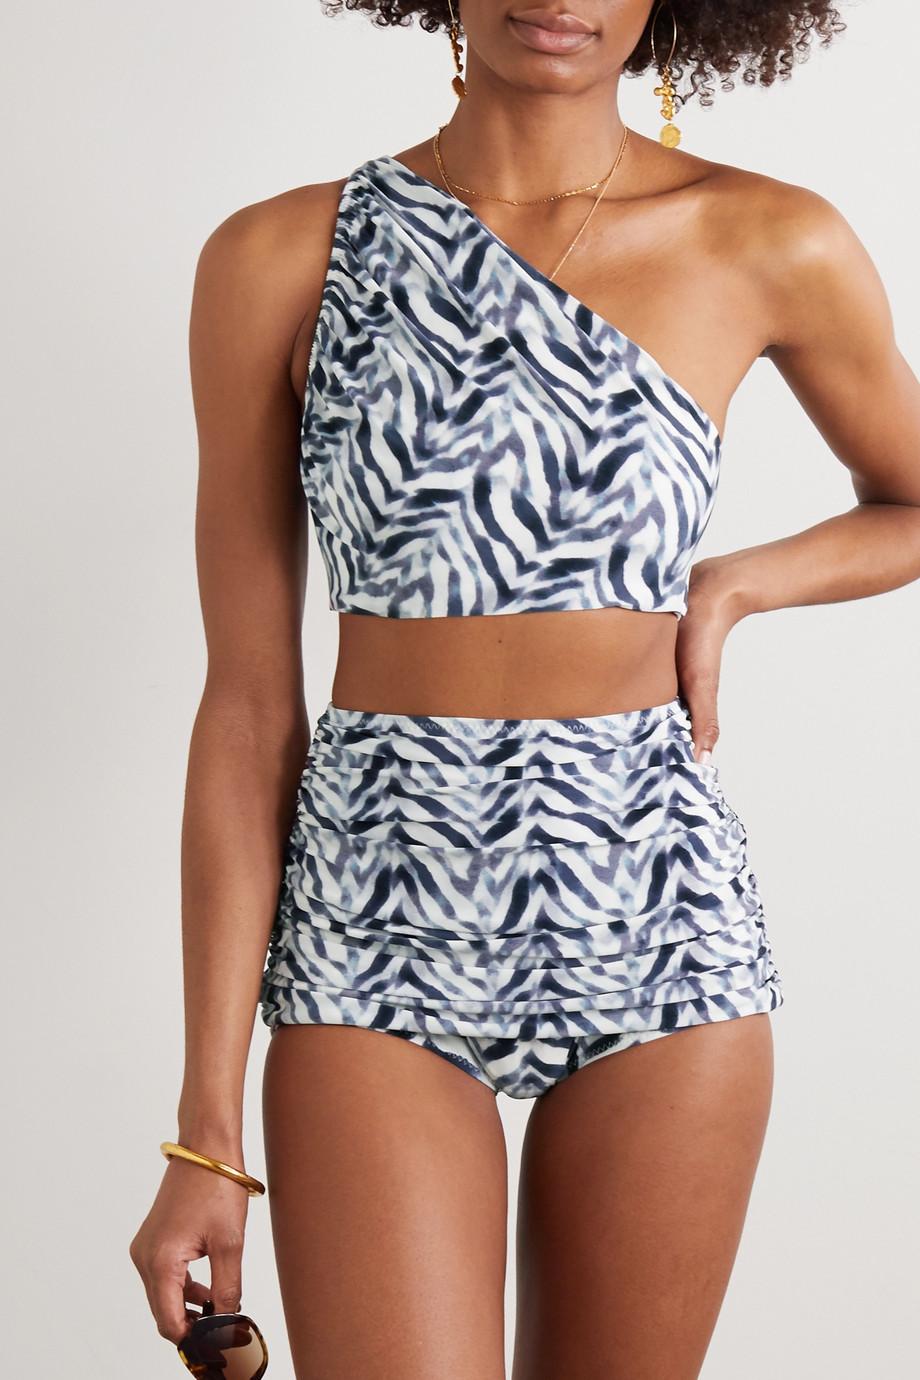 Norma Kamali Bill Bikini-Höschen mit Zebraprint und Raffung